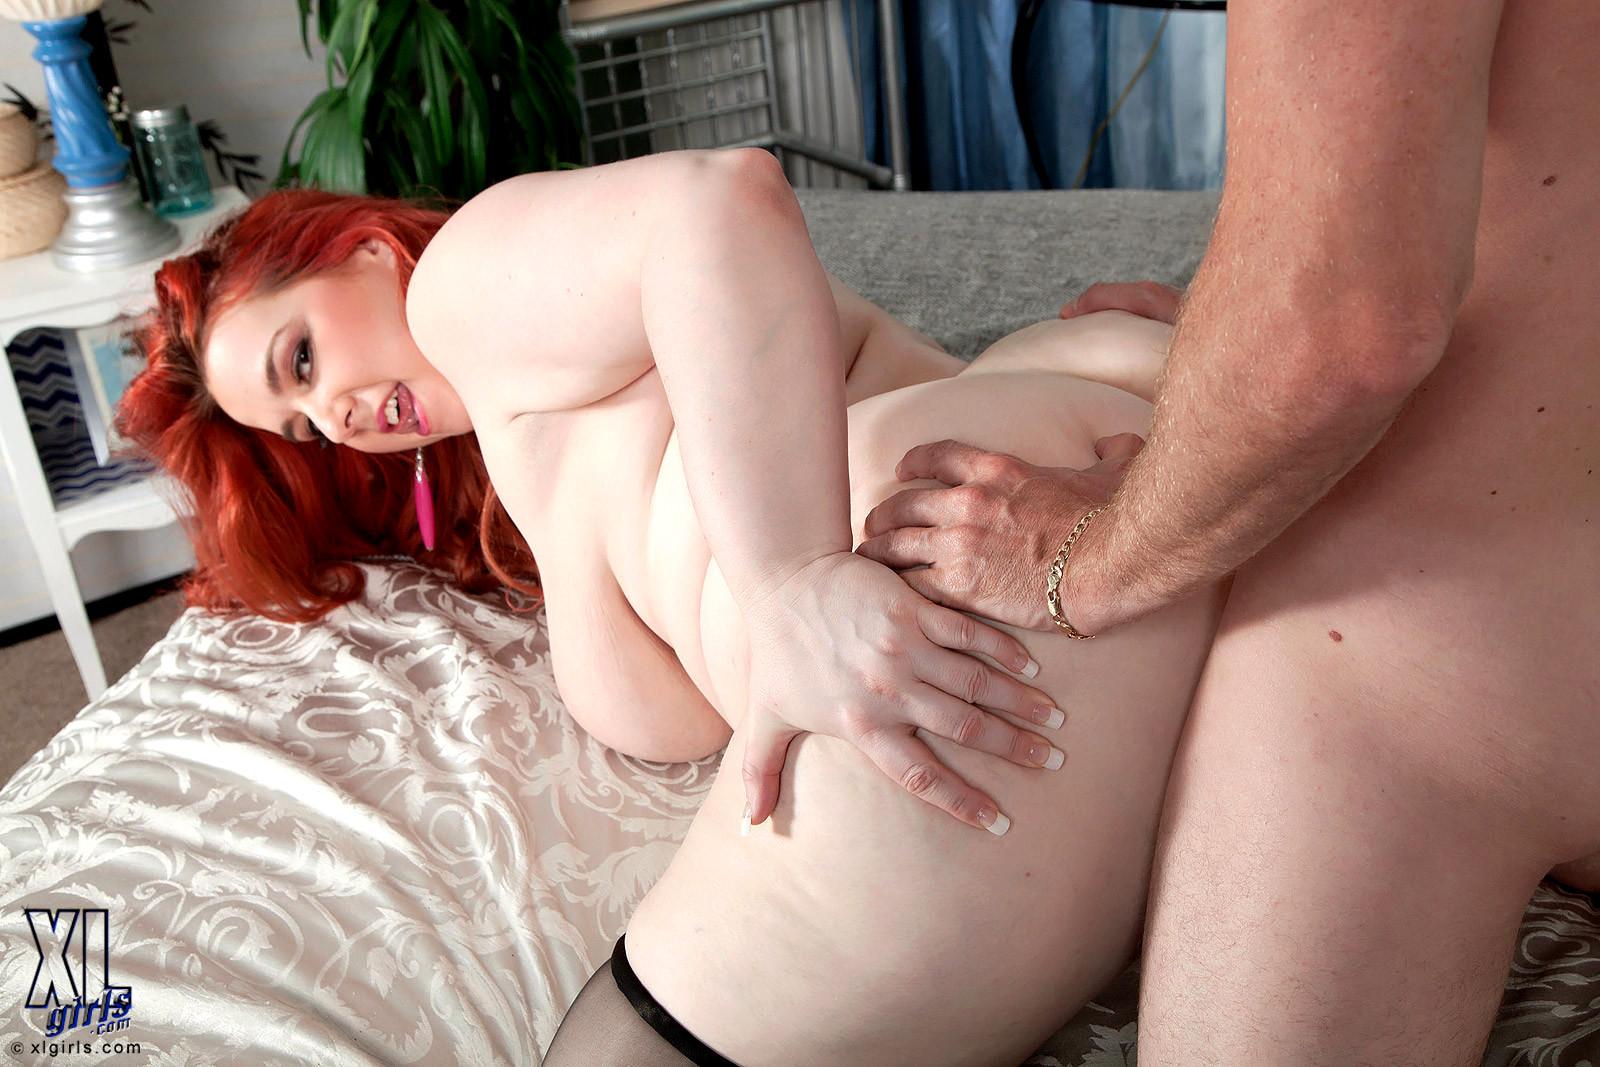 Hairy redhead threesome porn pics